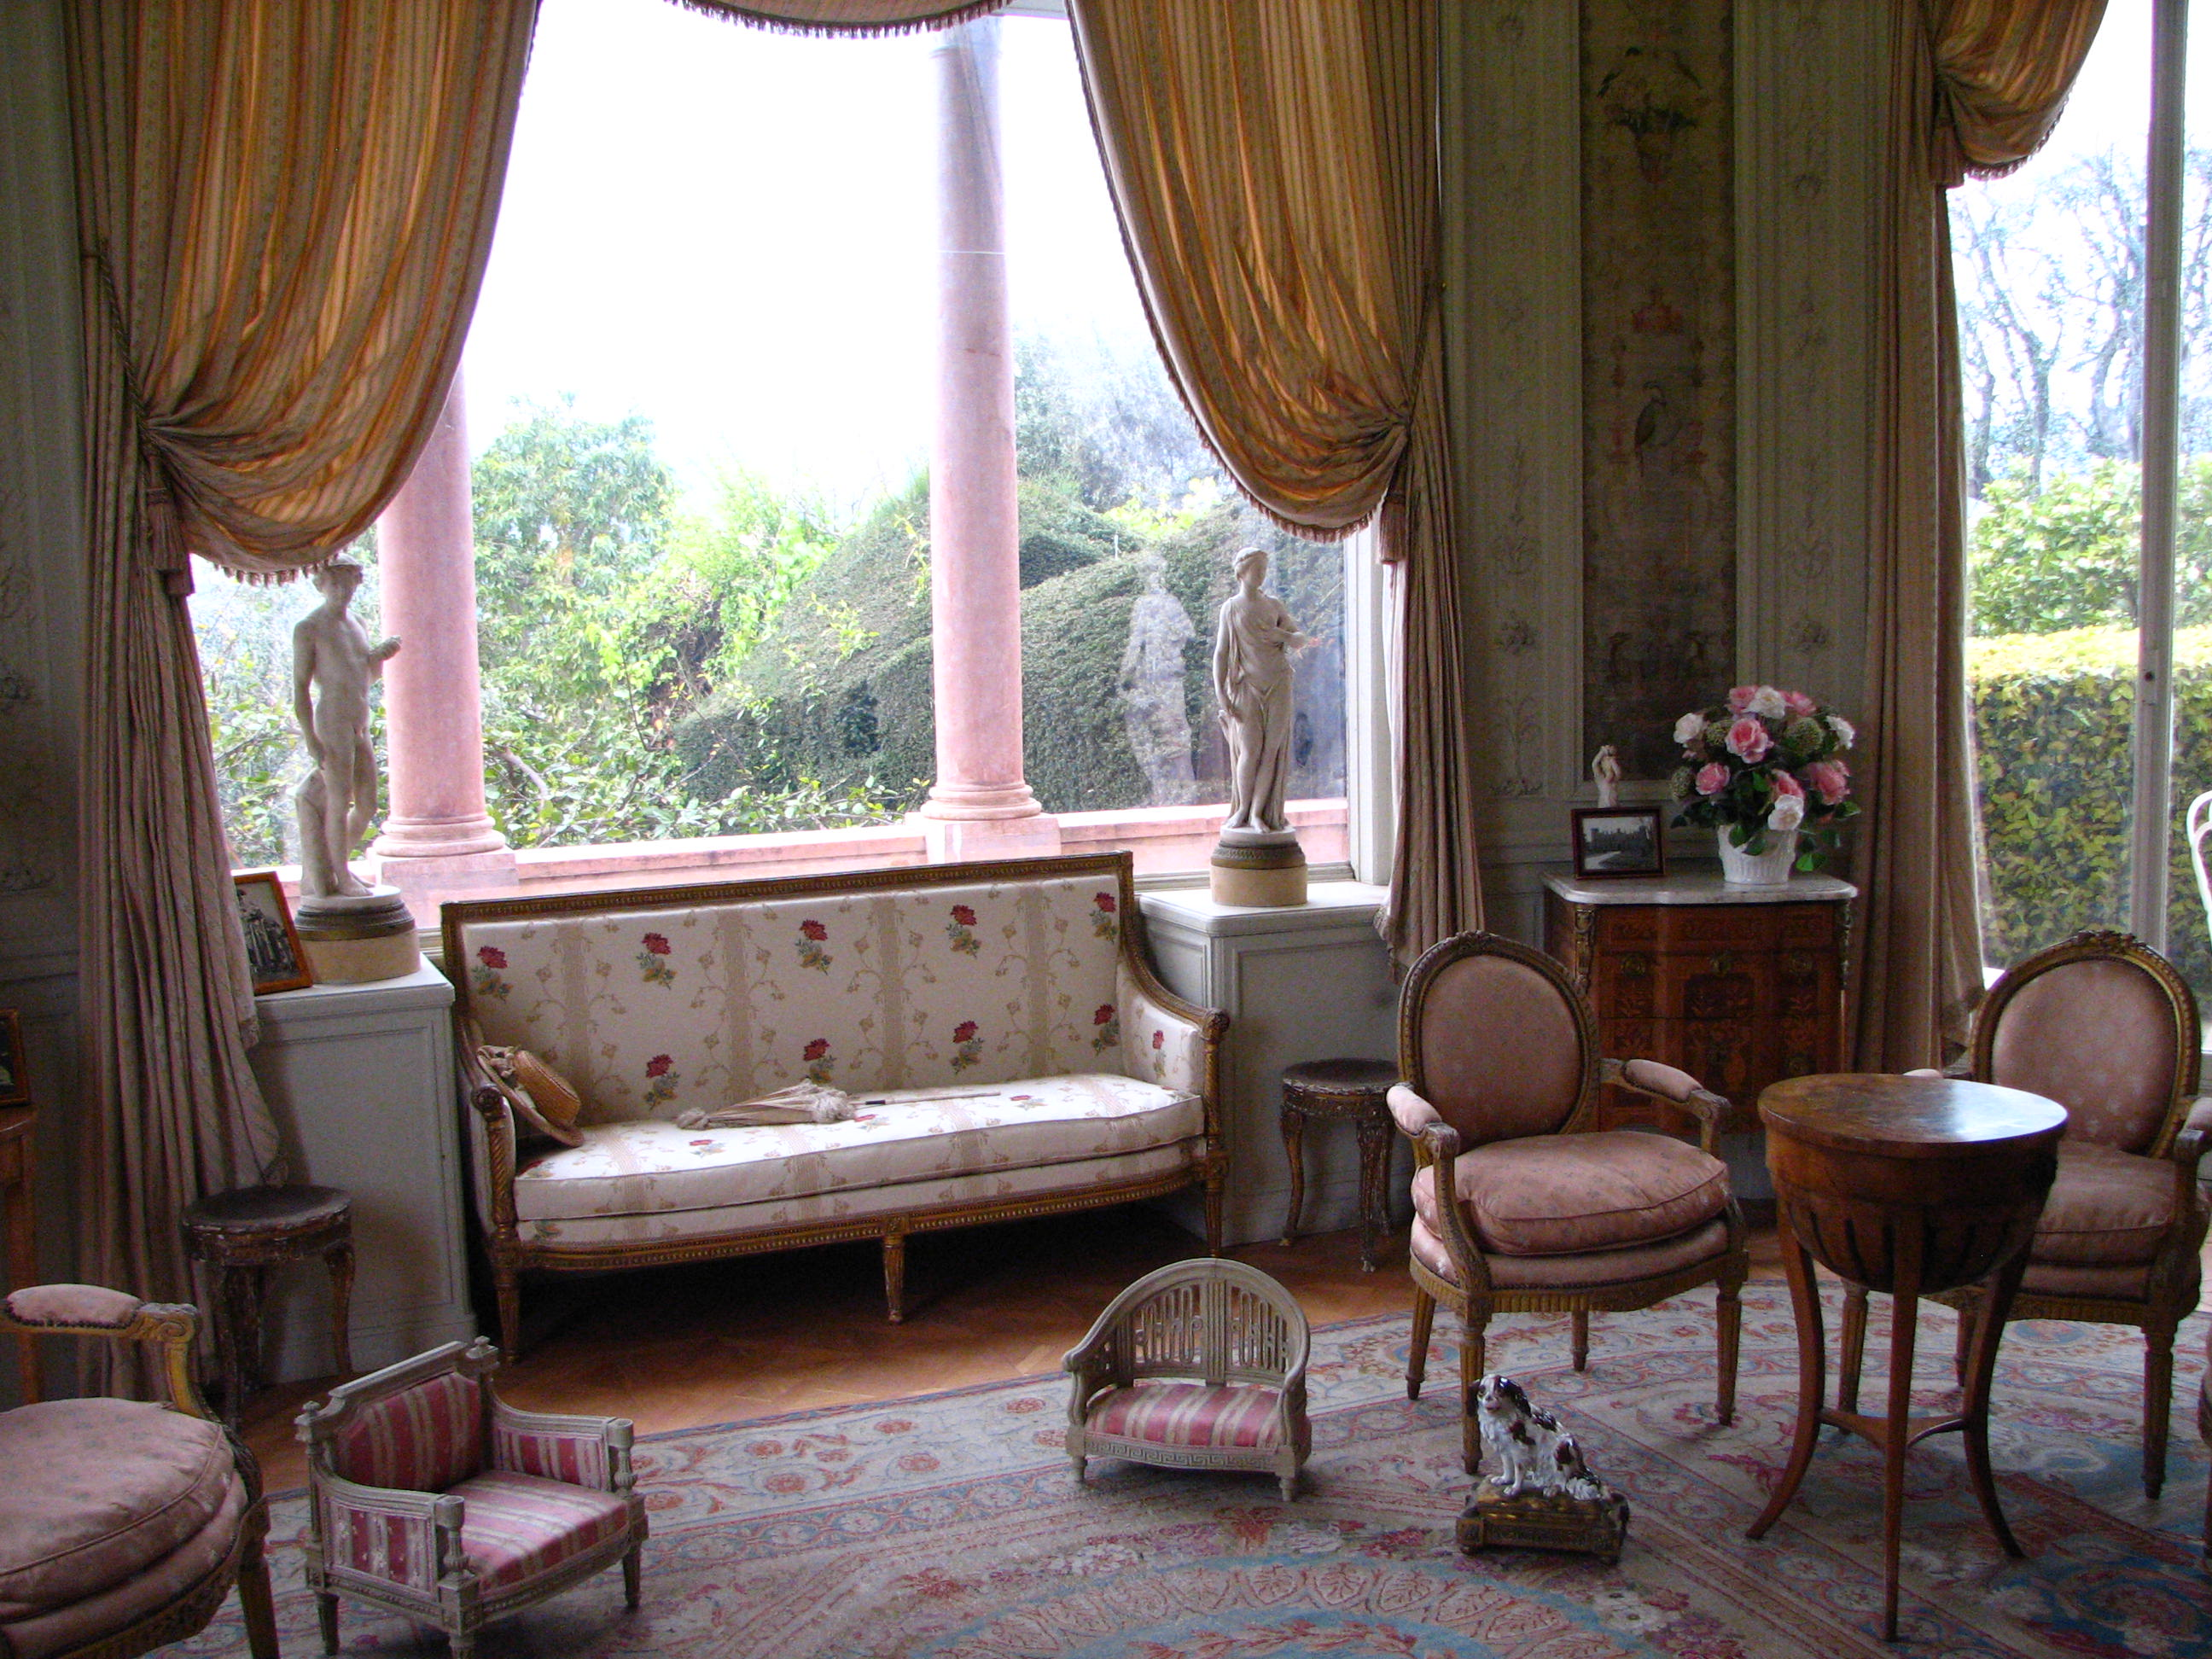 Villa ephrussi de rothschild for French interieur